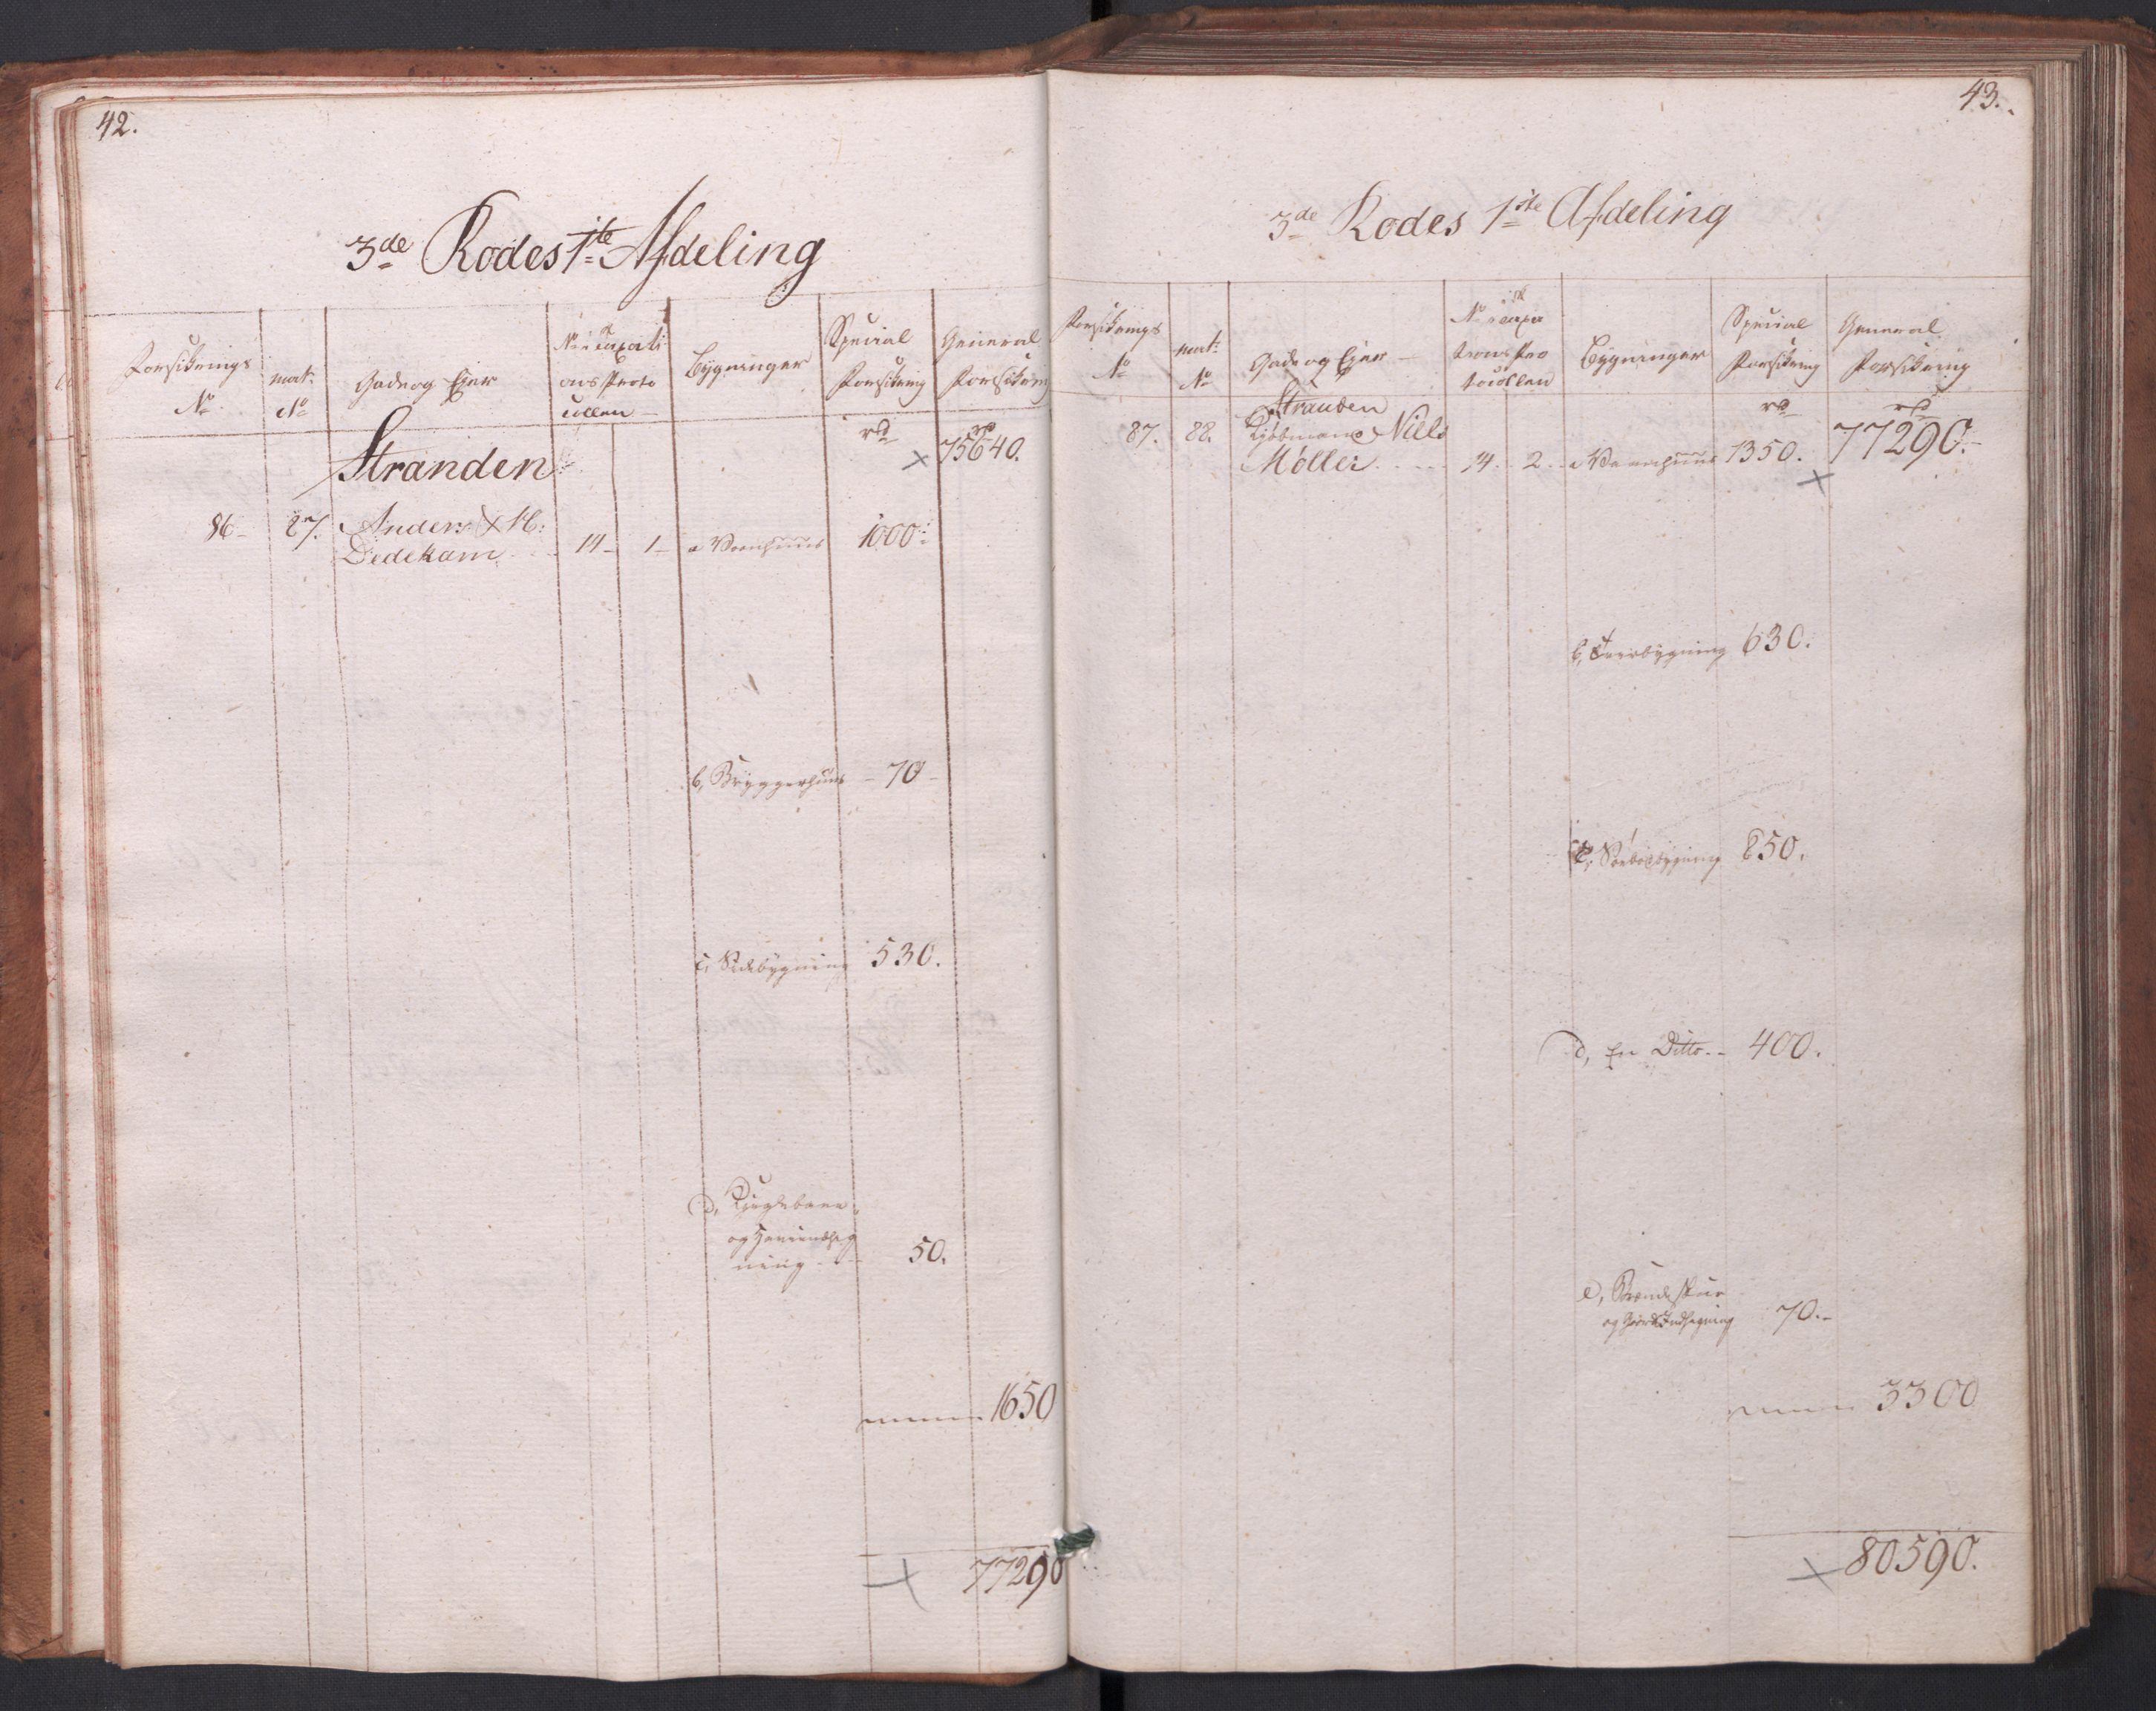 RA, Kommersekollegiet, Brannforsikringskontoret 1767-1814, F/Fa/L0003: Arendal, 1807-1817, s. 42-43